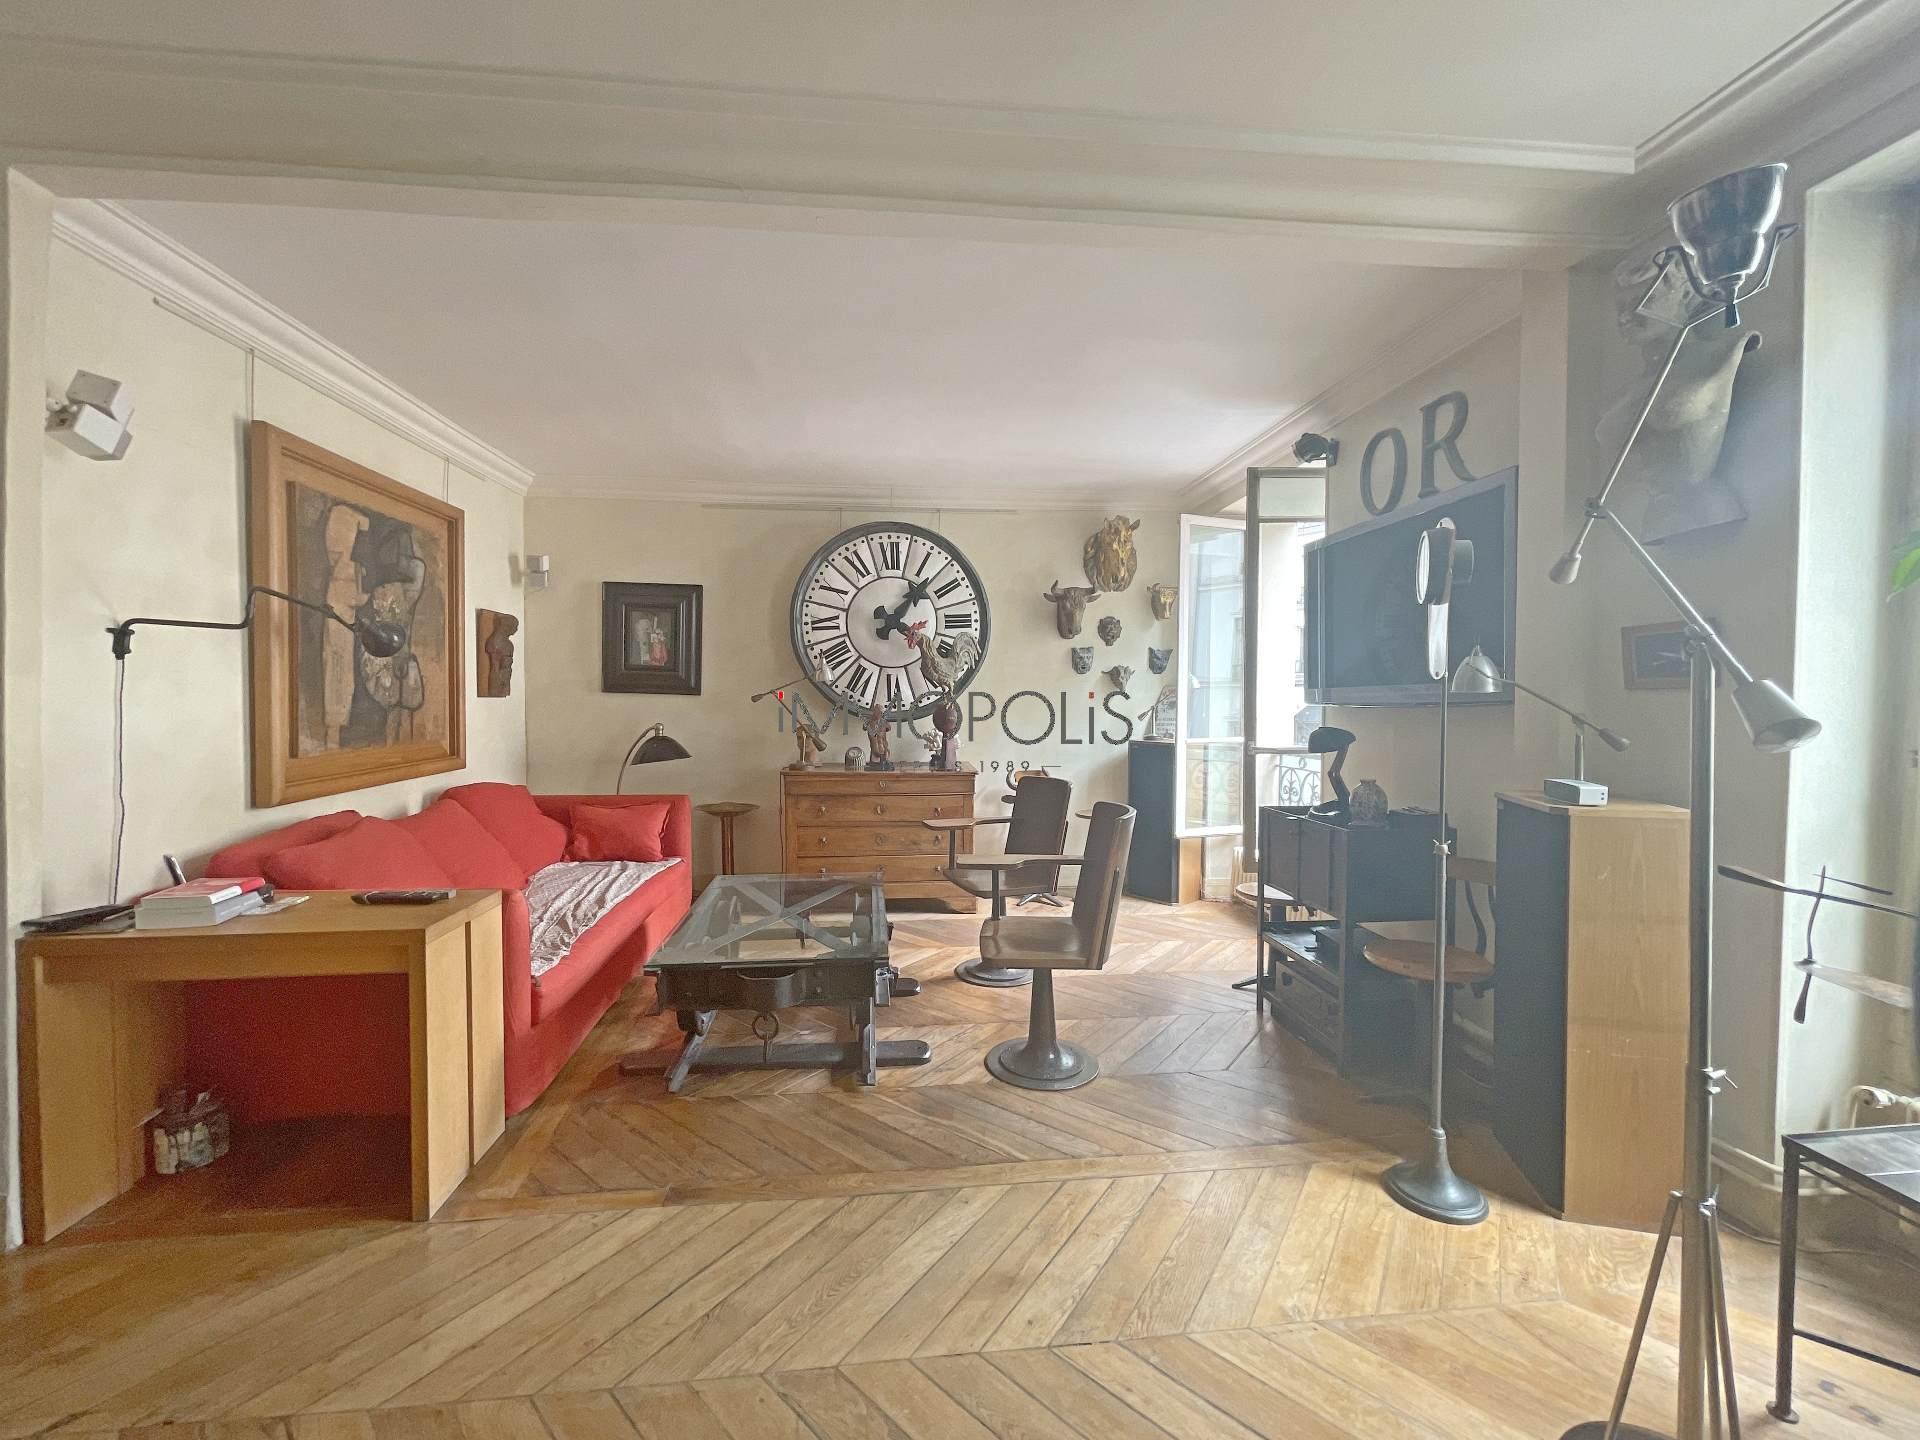 3 rooms Rue Ravignan duplex + room of service! 2